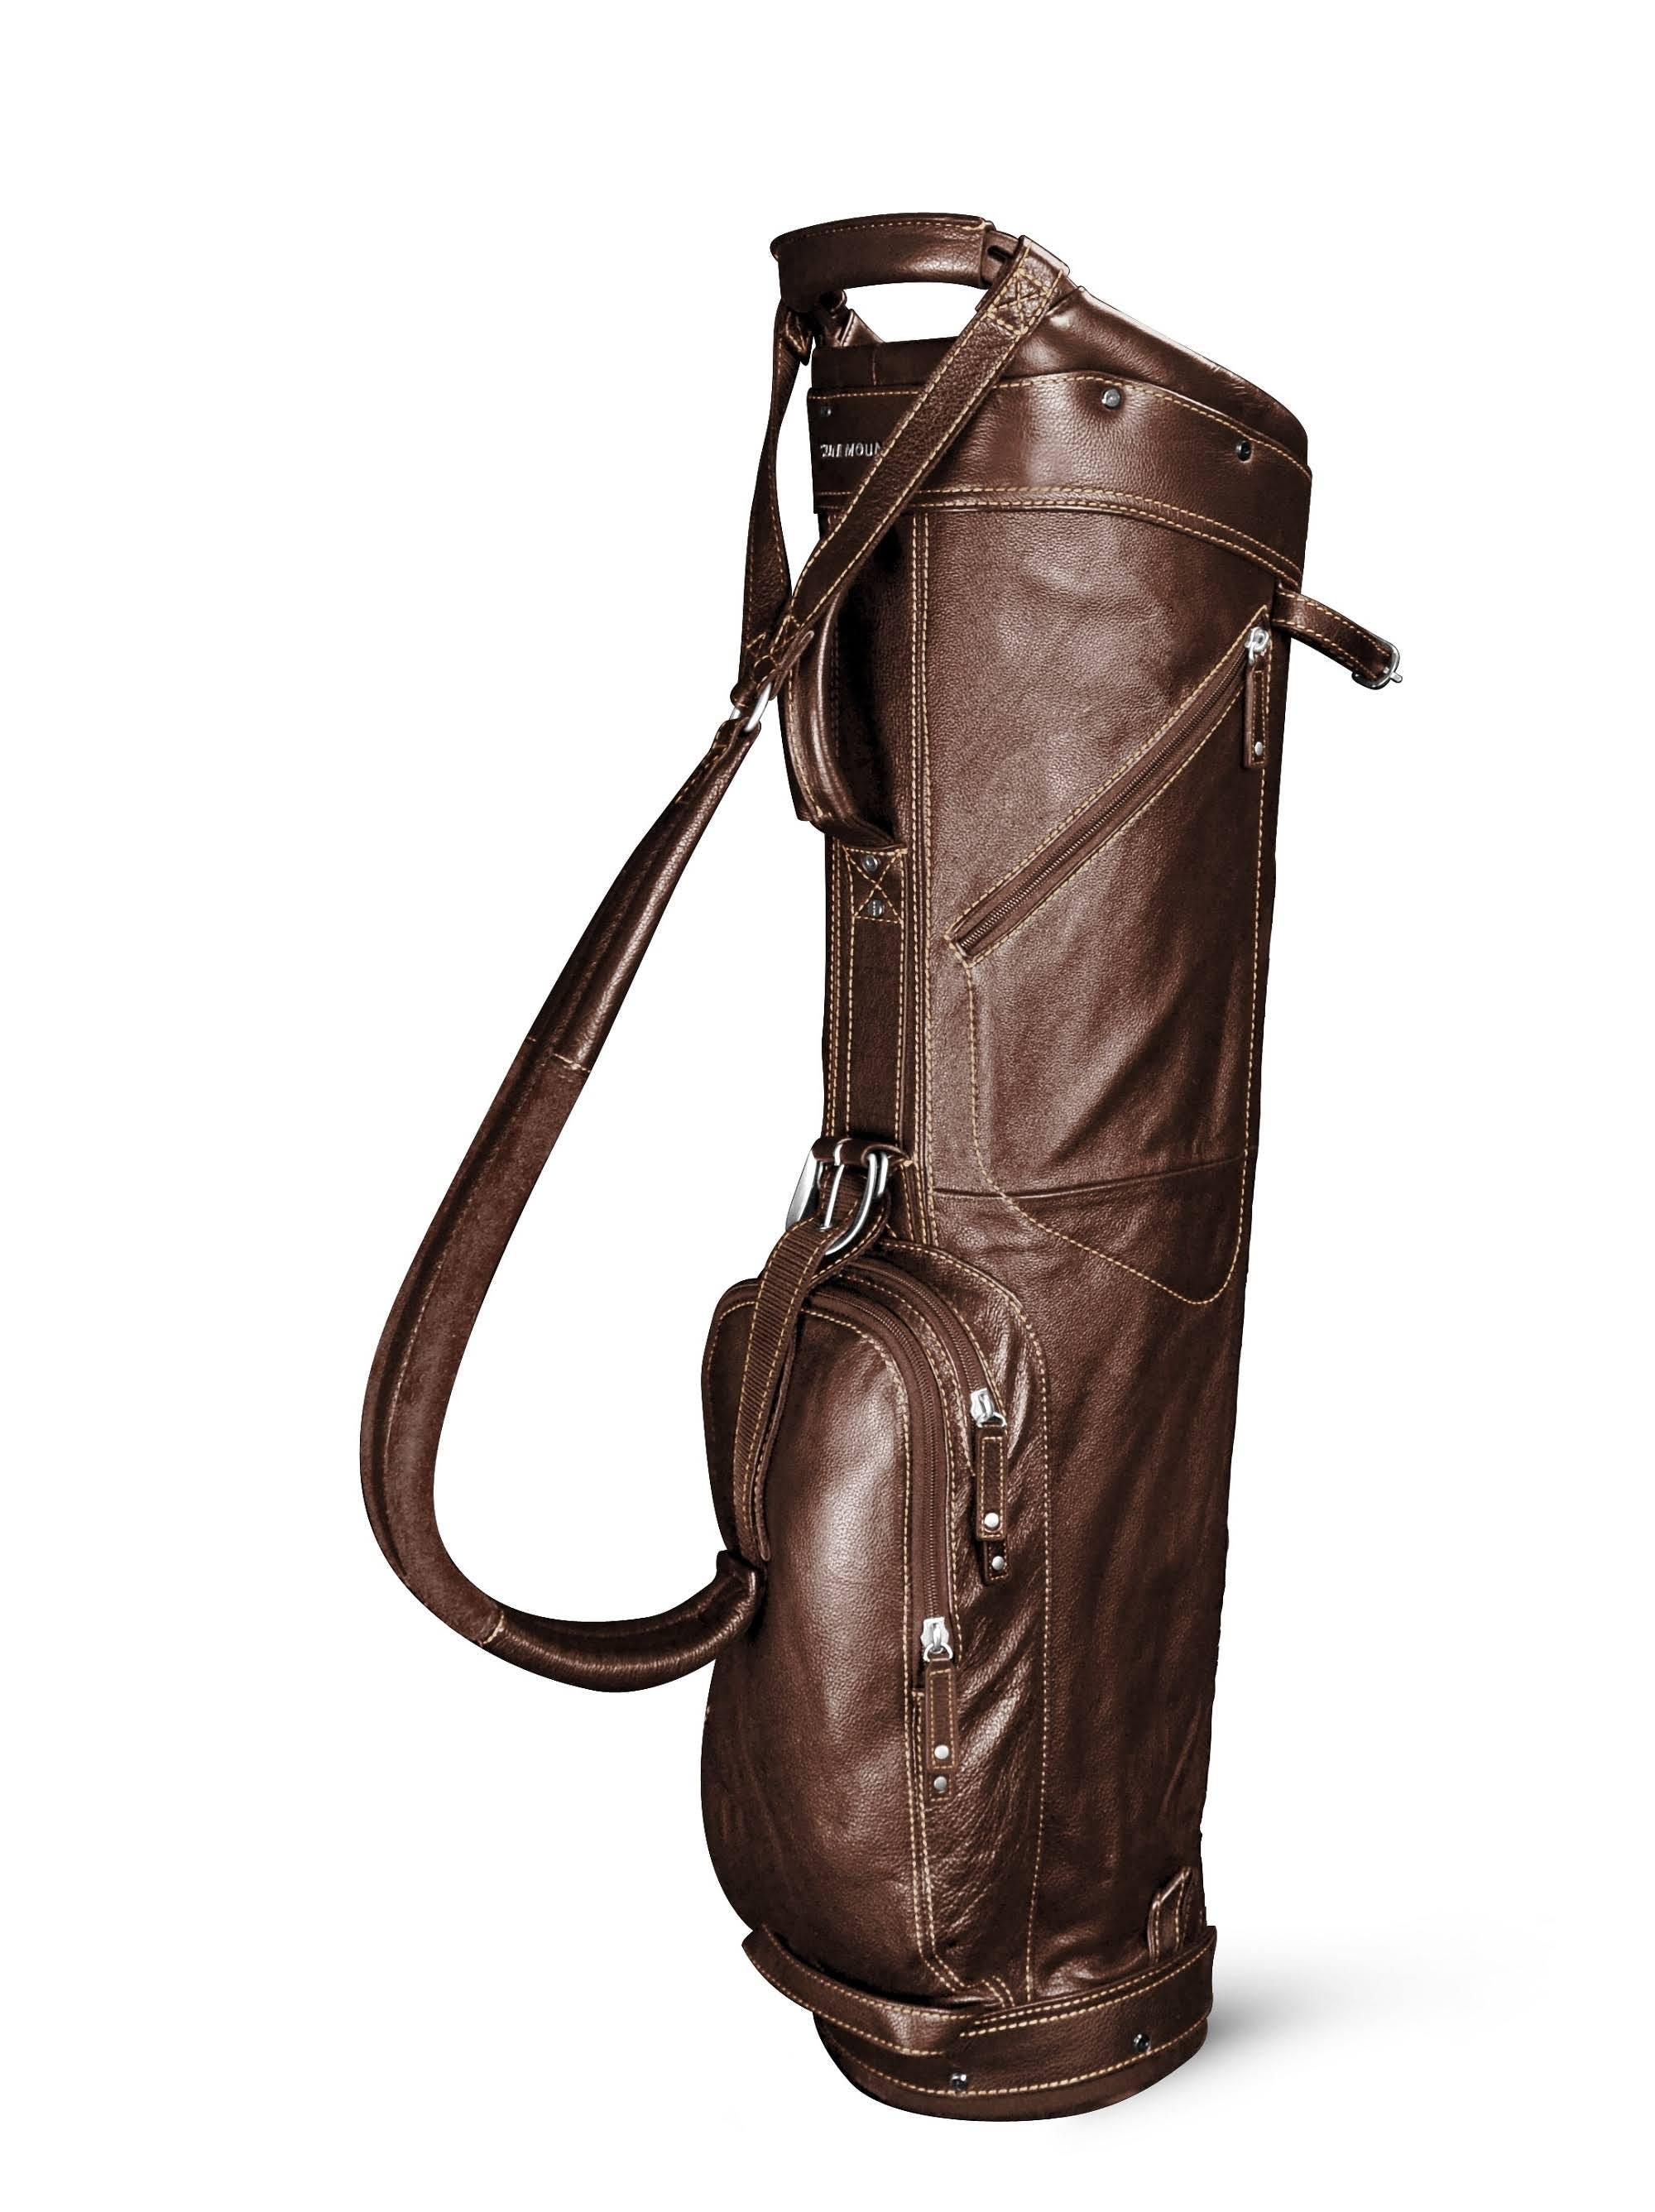 Sun Mountain Leather Sunday Bag, Brown/Khaki